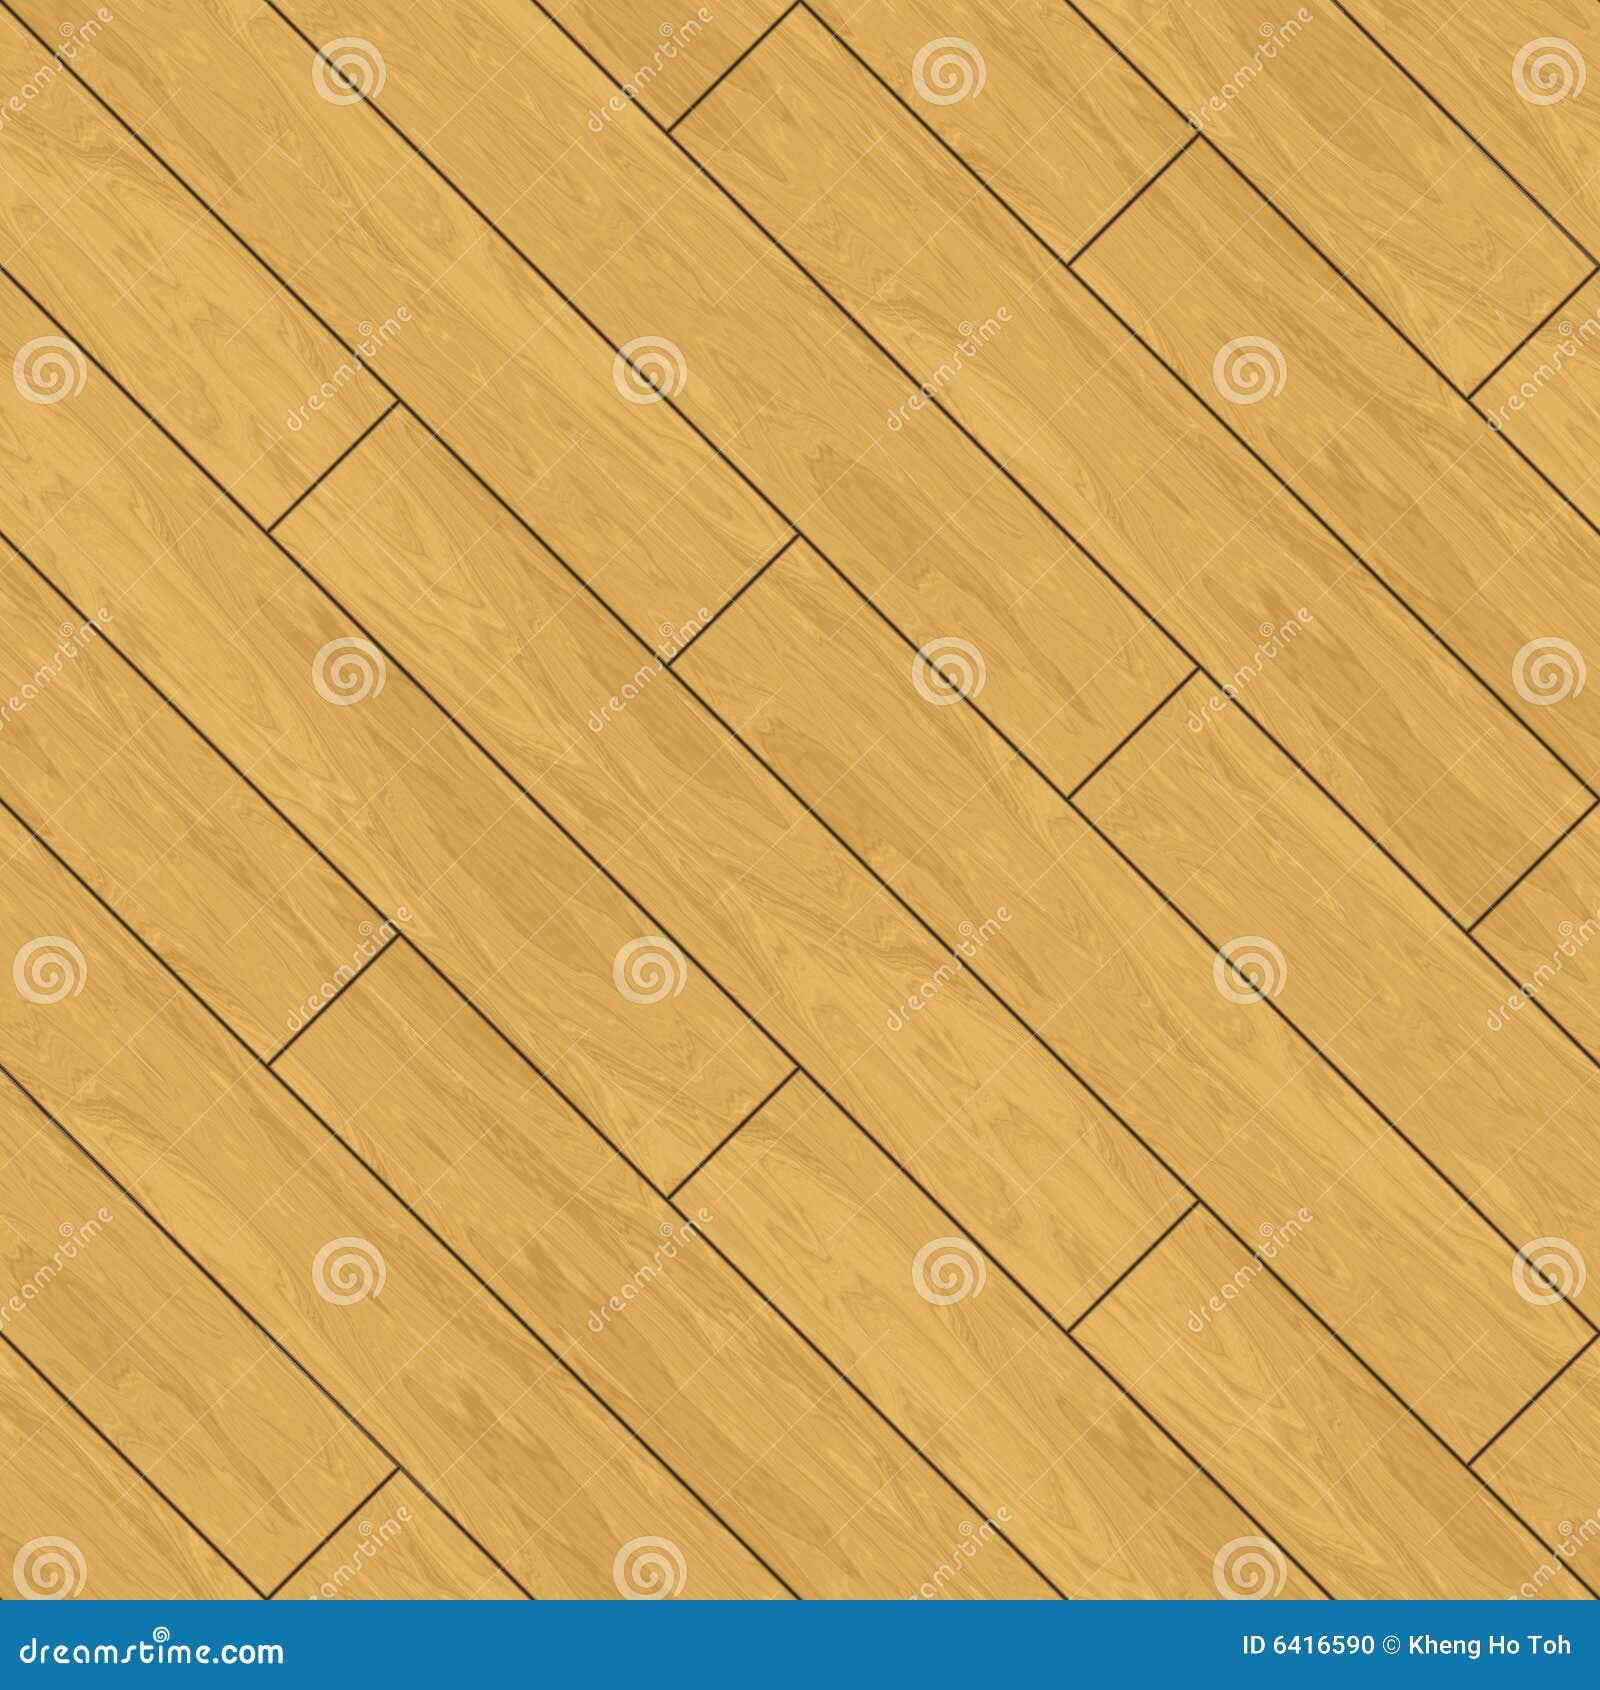 Download Seamless Parquet Wooden Flooring Stock Illustration